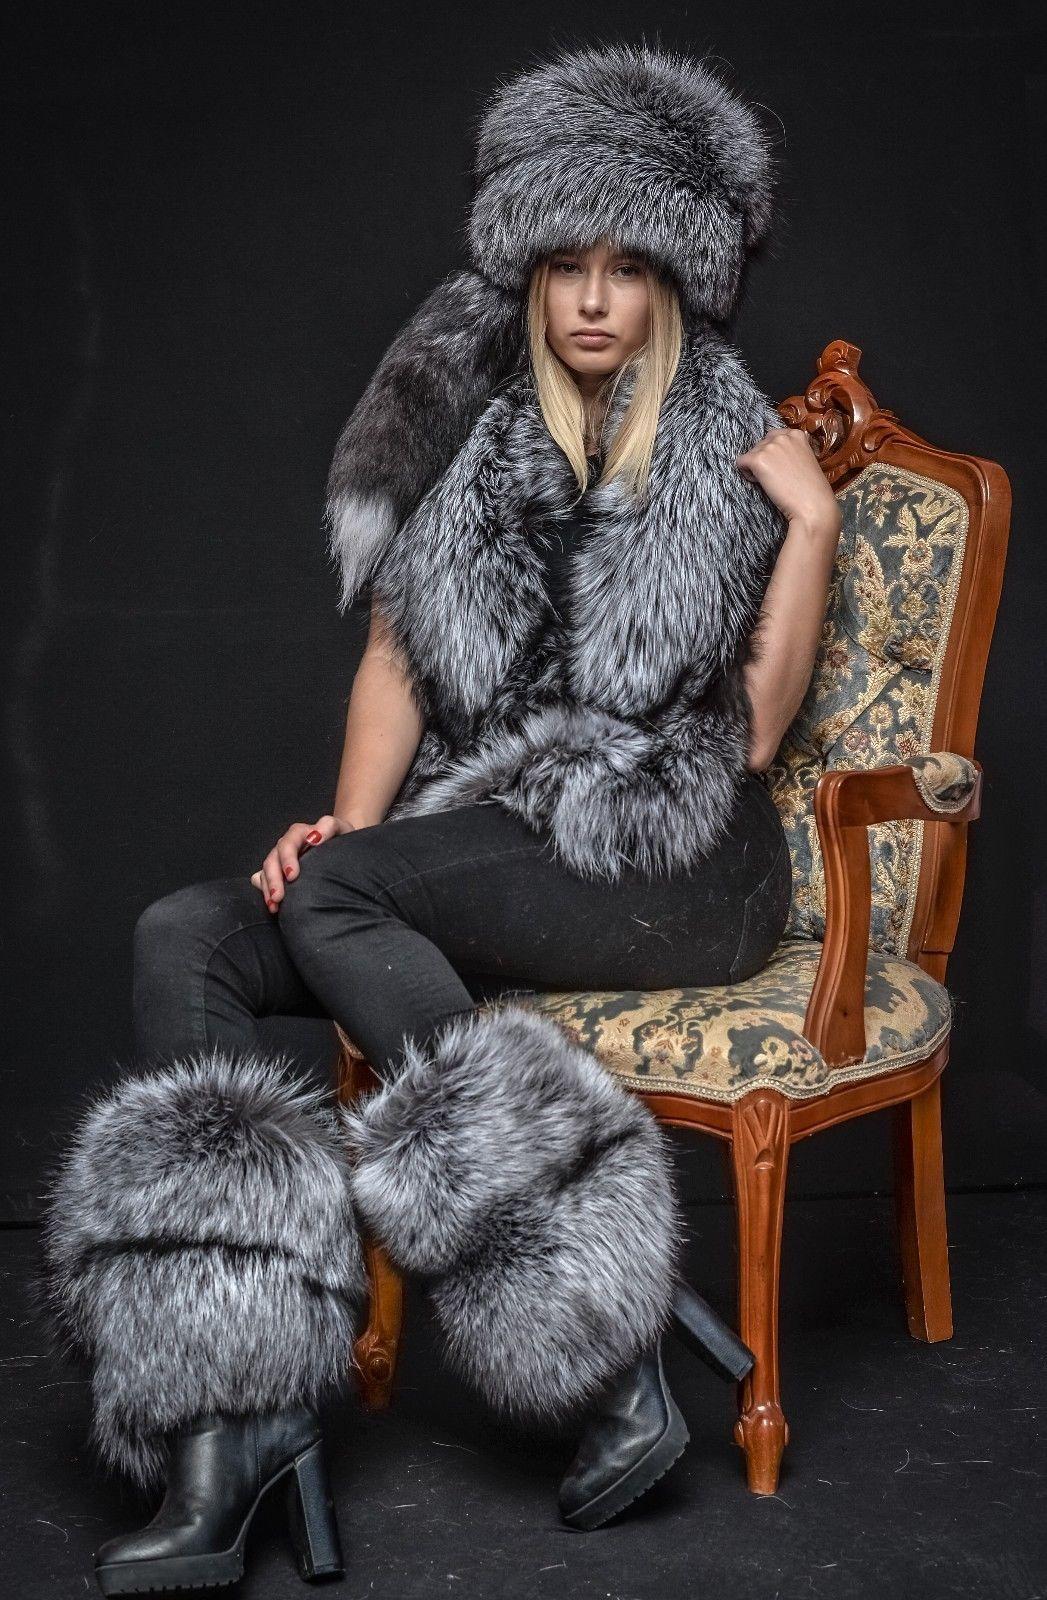 2b6ac2bb6c534 Details about Saga Furs Natural Silver Fox Fur Royal Winter Posh ...